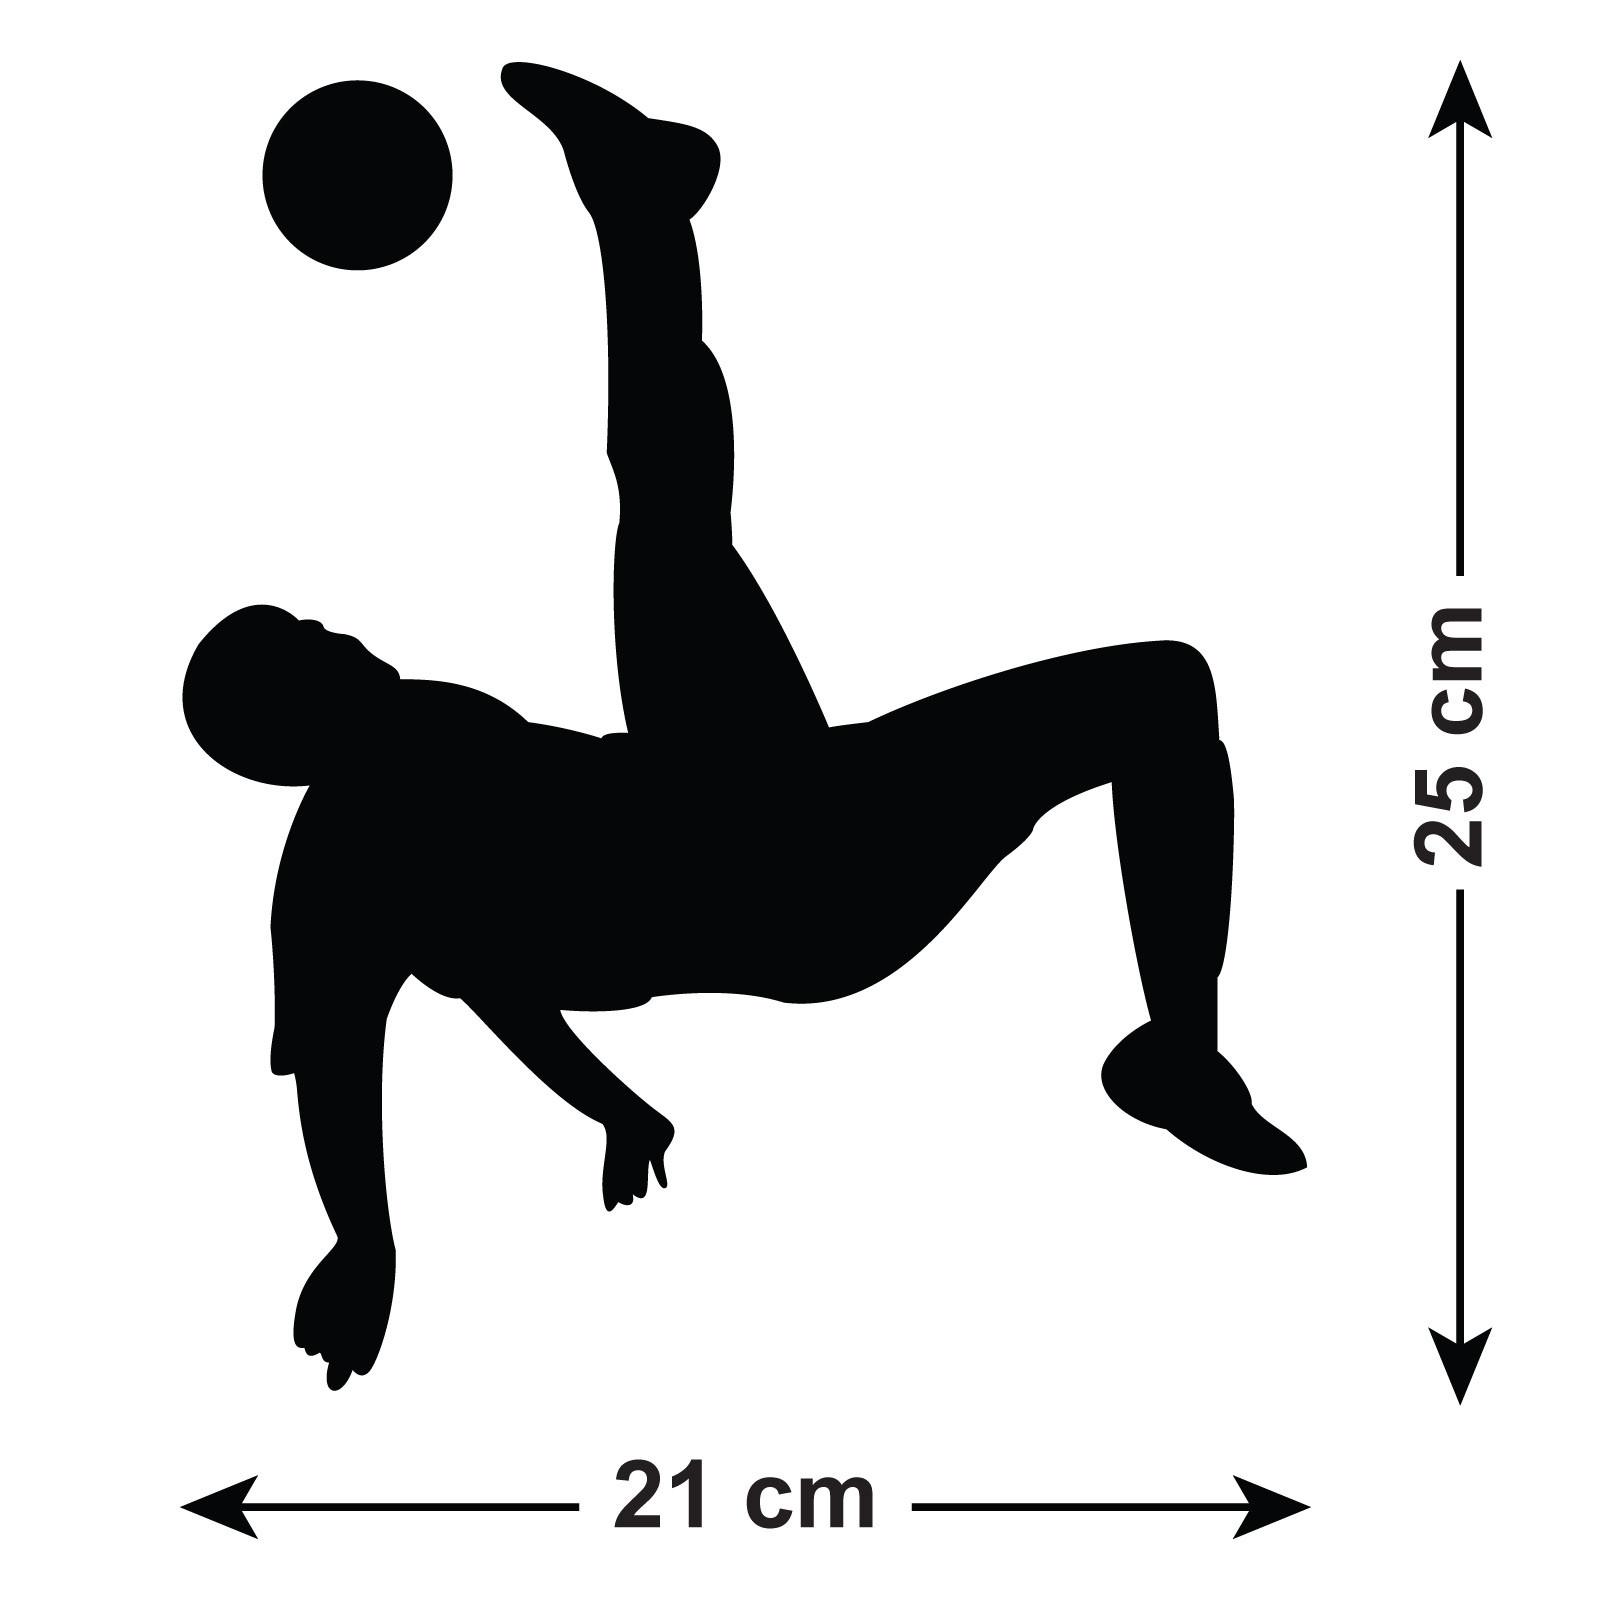 1600x1600 Public Domain Clip Art Image Freestyle Soccer Silhouette Id